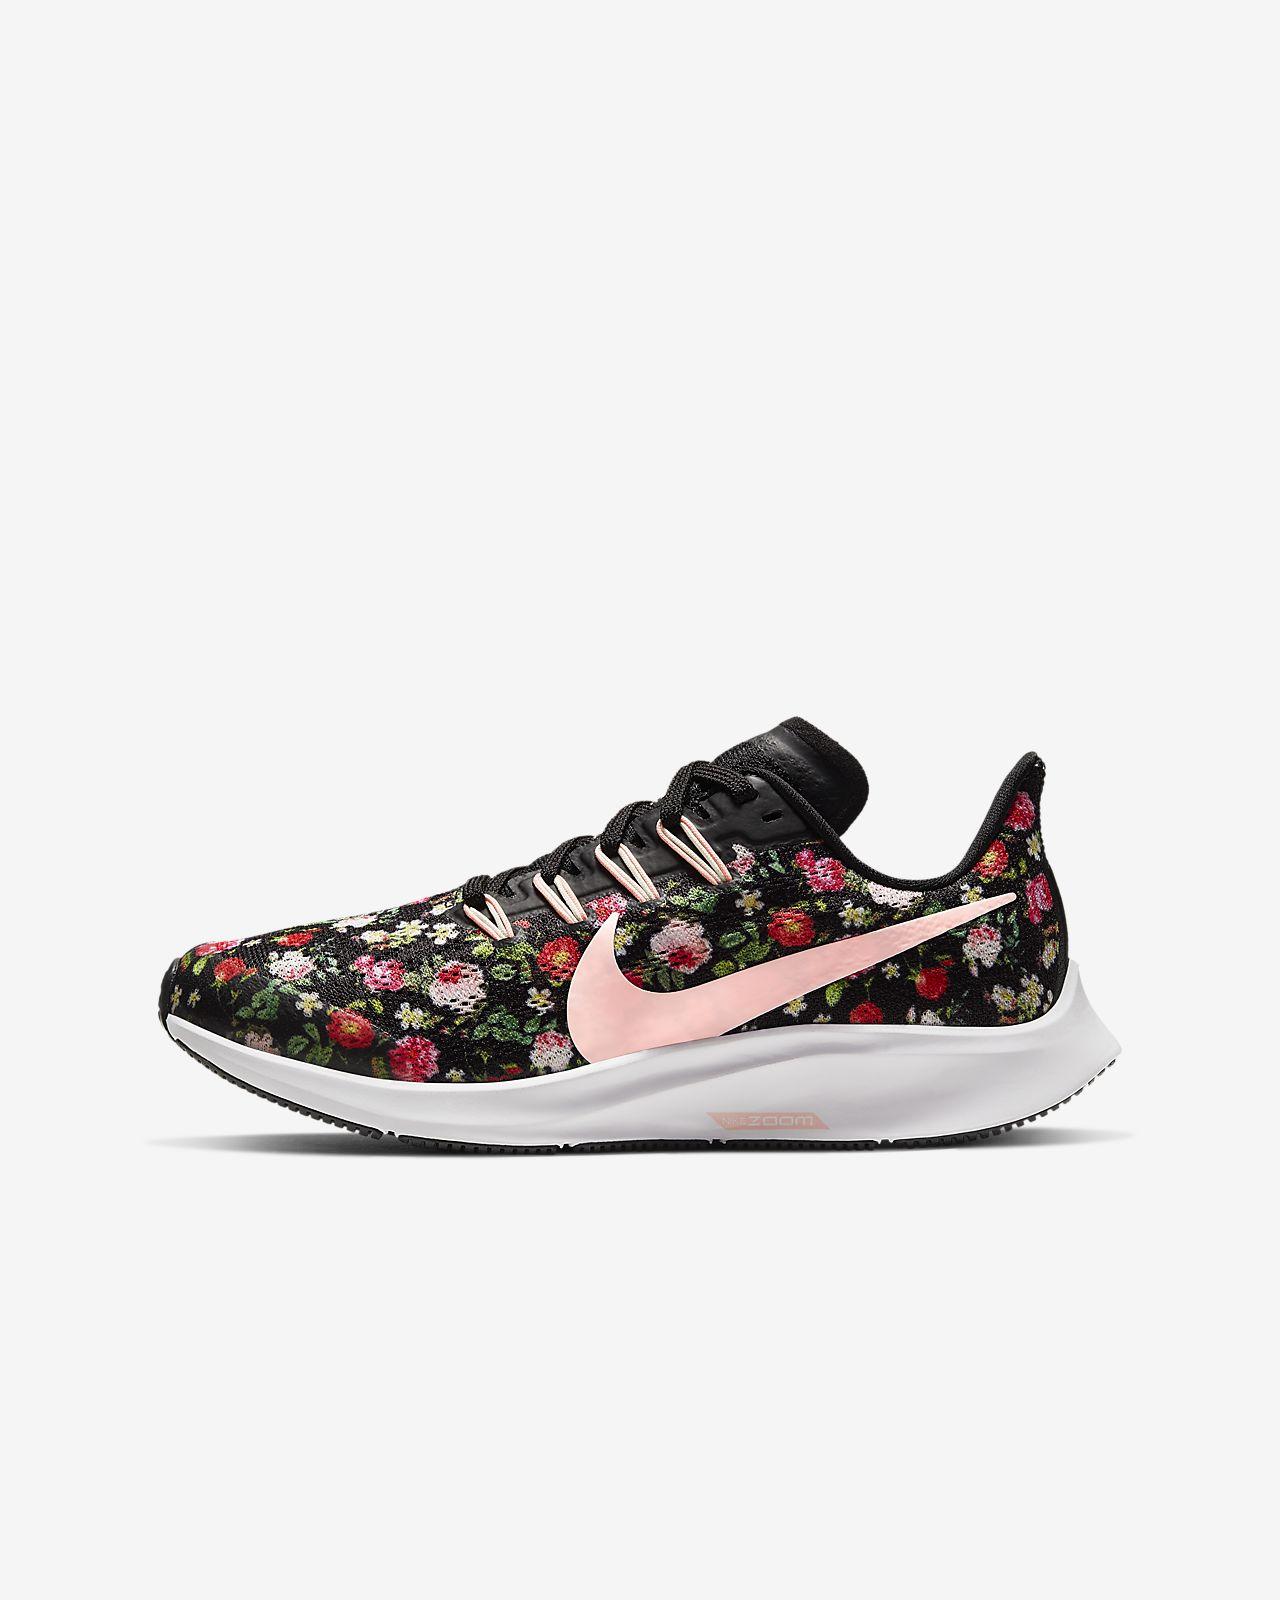 Sko Nike Air Zoom Pegasus Vintage Floral för barn/ungdom